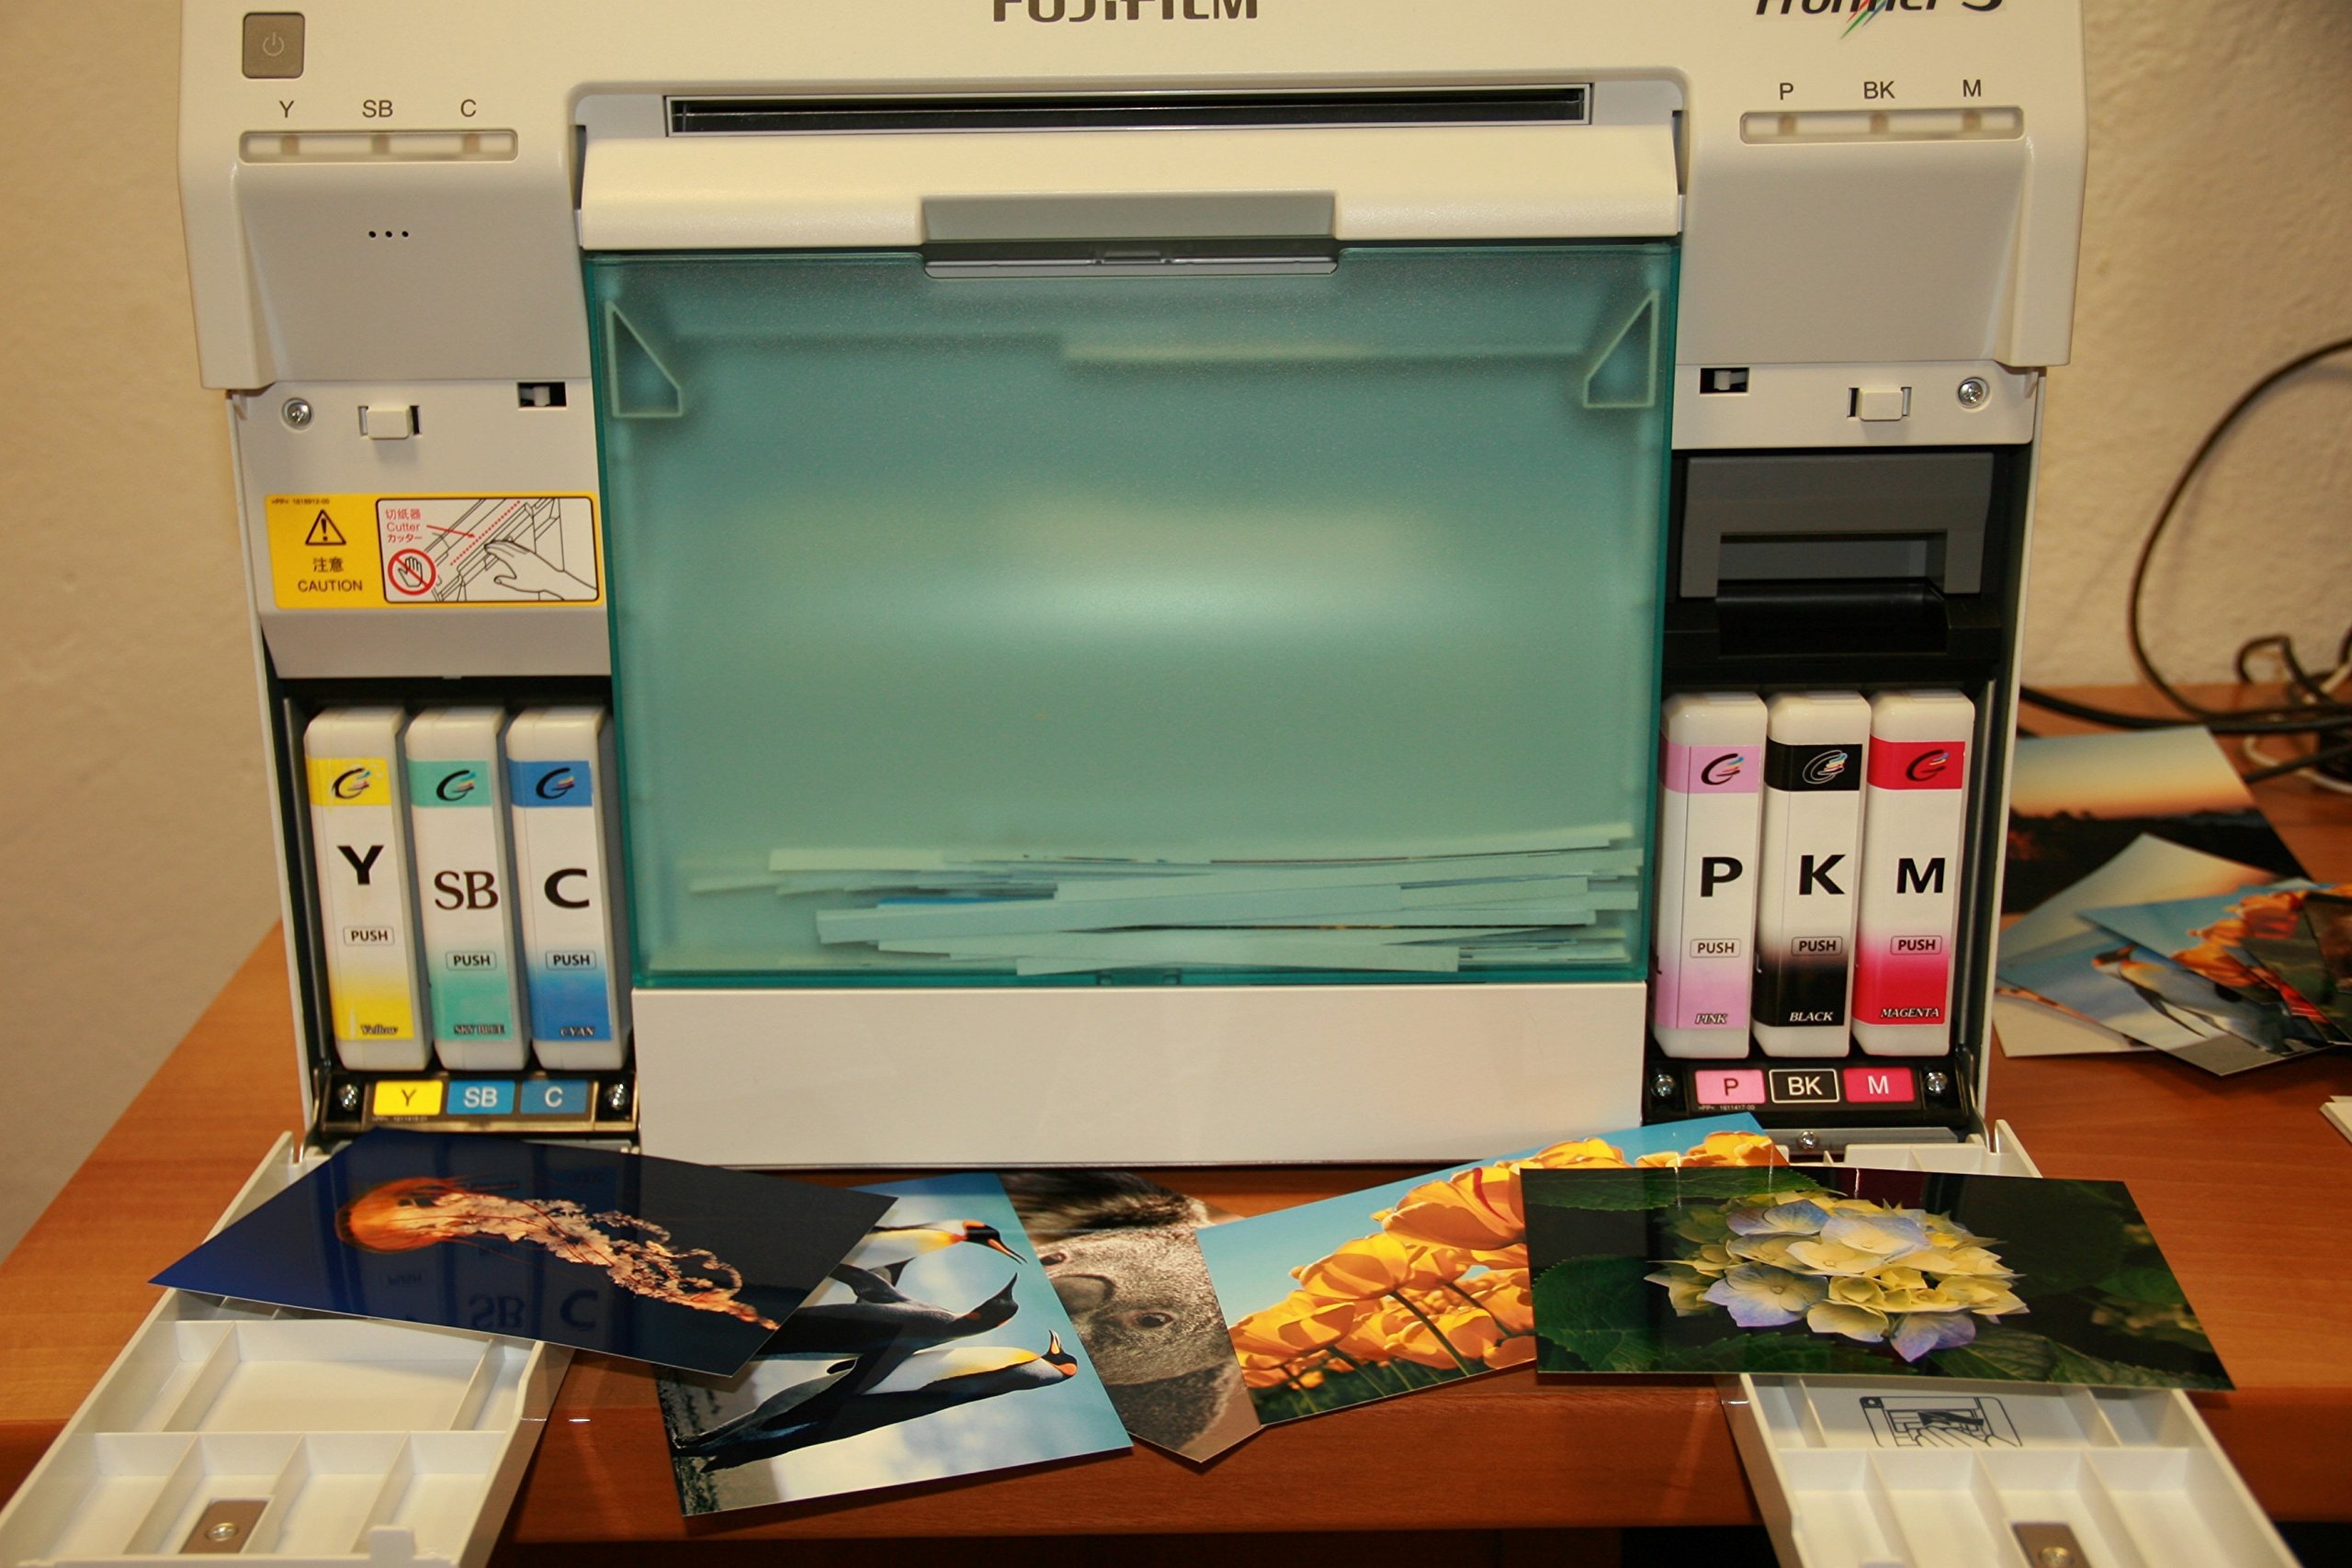 NEW 6-COLOR FujiFilm VIVIDIA Ink Cartridge Frontier-S DX100 Printer